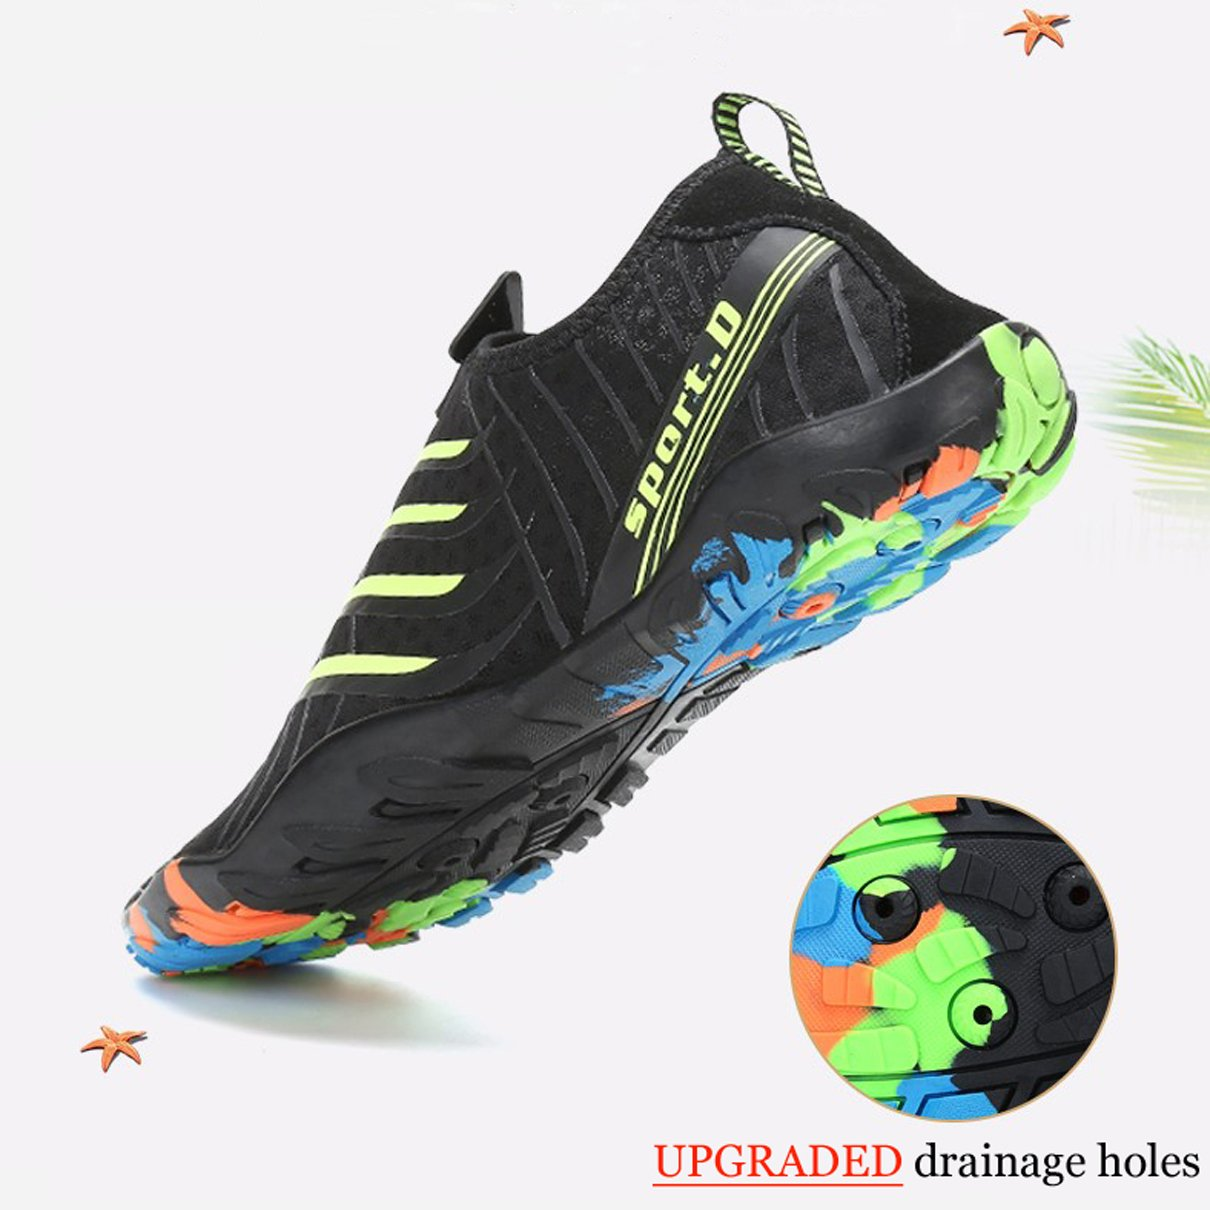 5bb1774b Maniamixx Zapatos de agua nadar para mujer Zapatos deportivos para mujeres  Zapatos de aguamarina de secado rápido Sandalias para la playa, nadar,  bucear ...